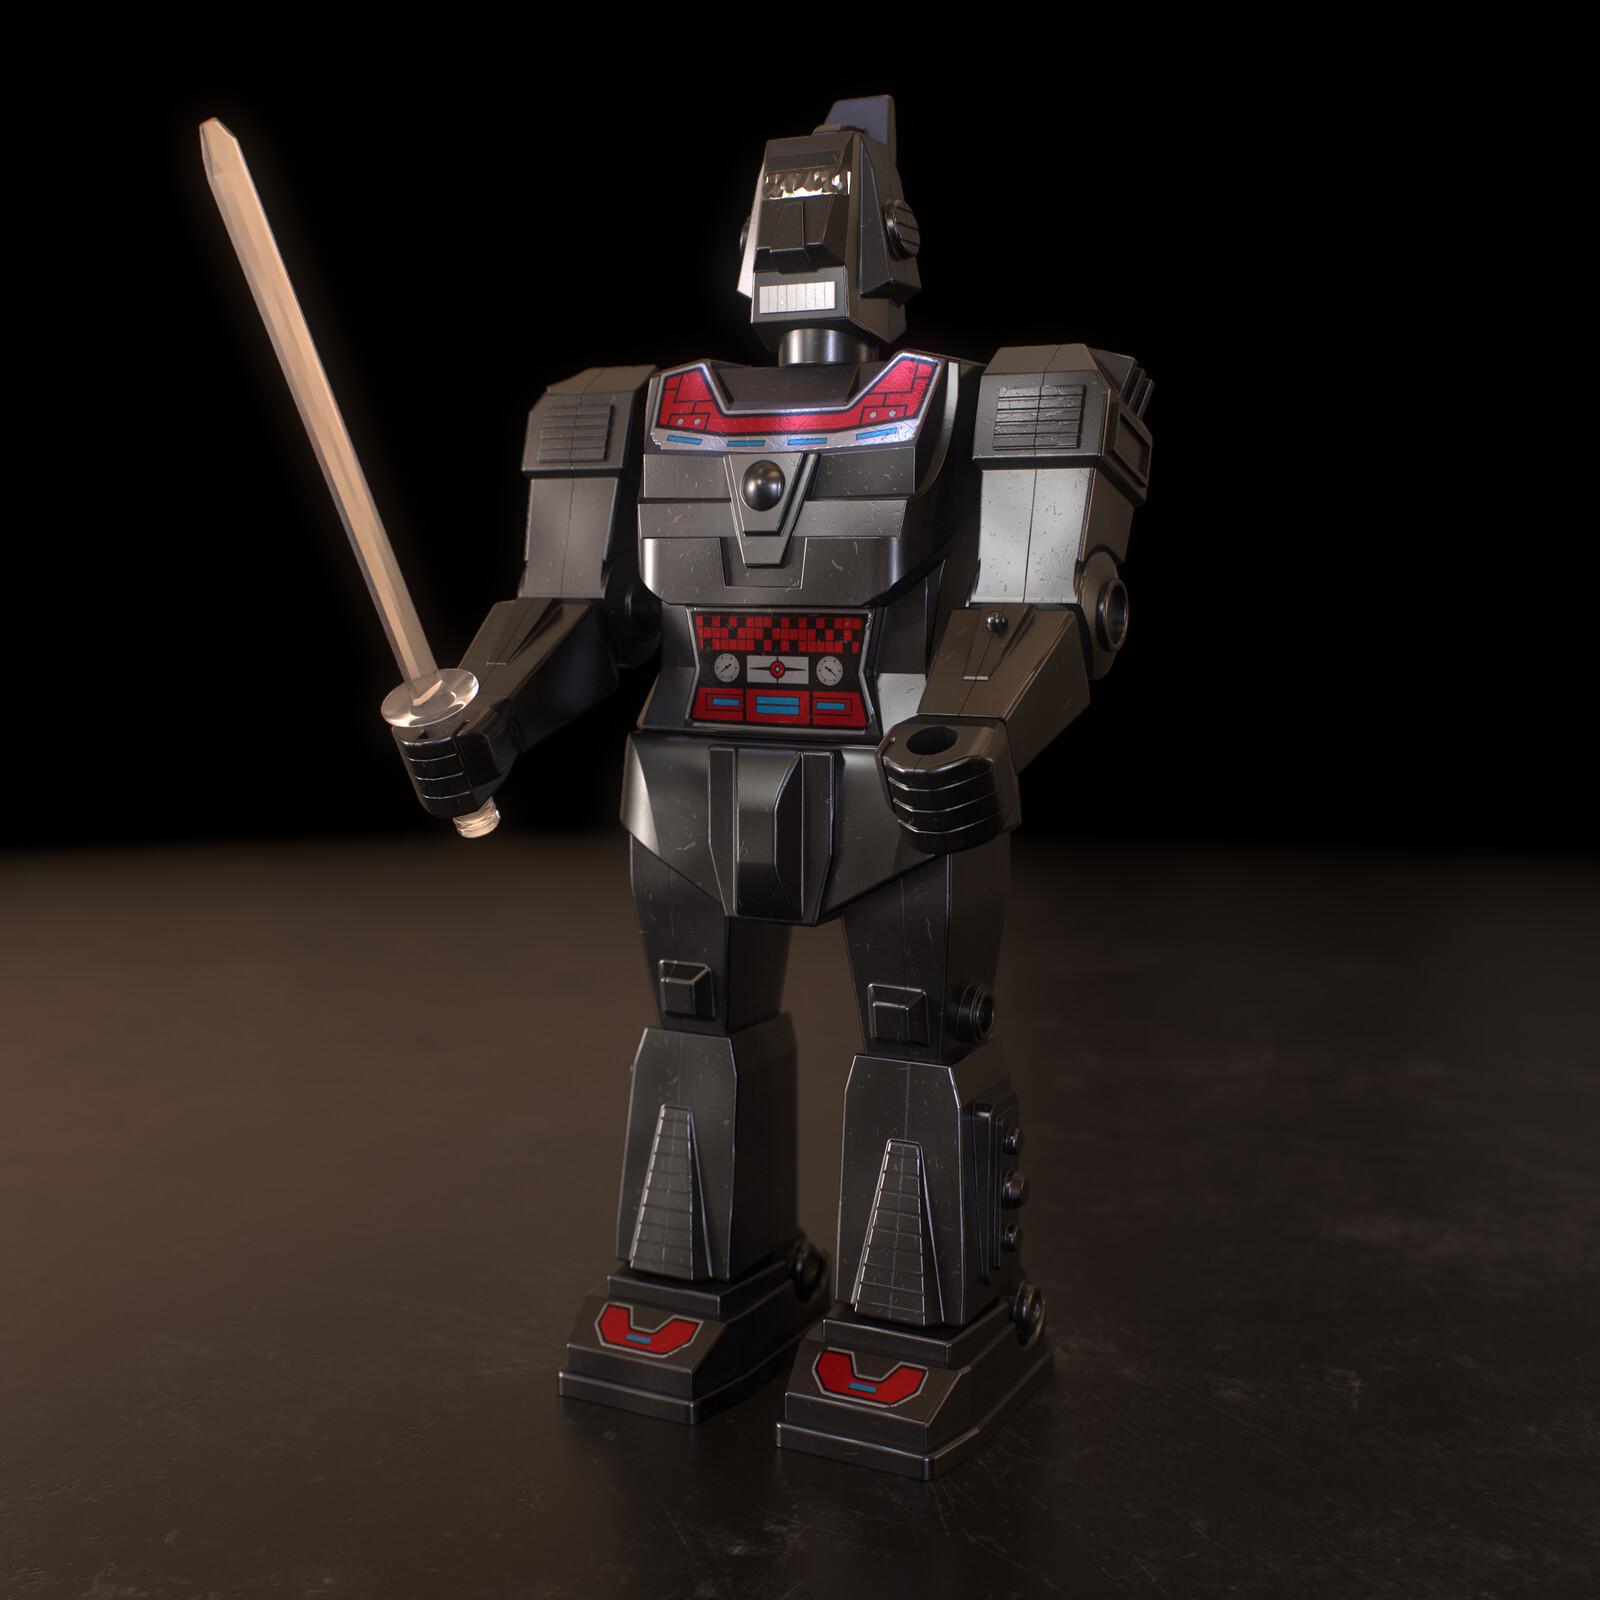 Robot Warrior (1984)